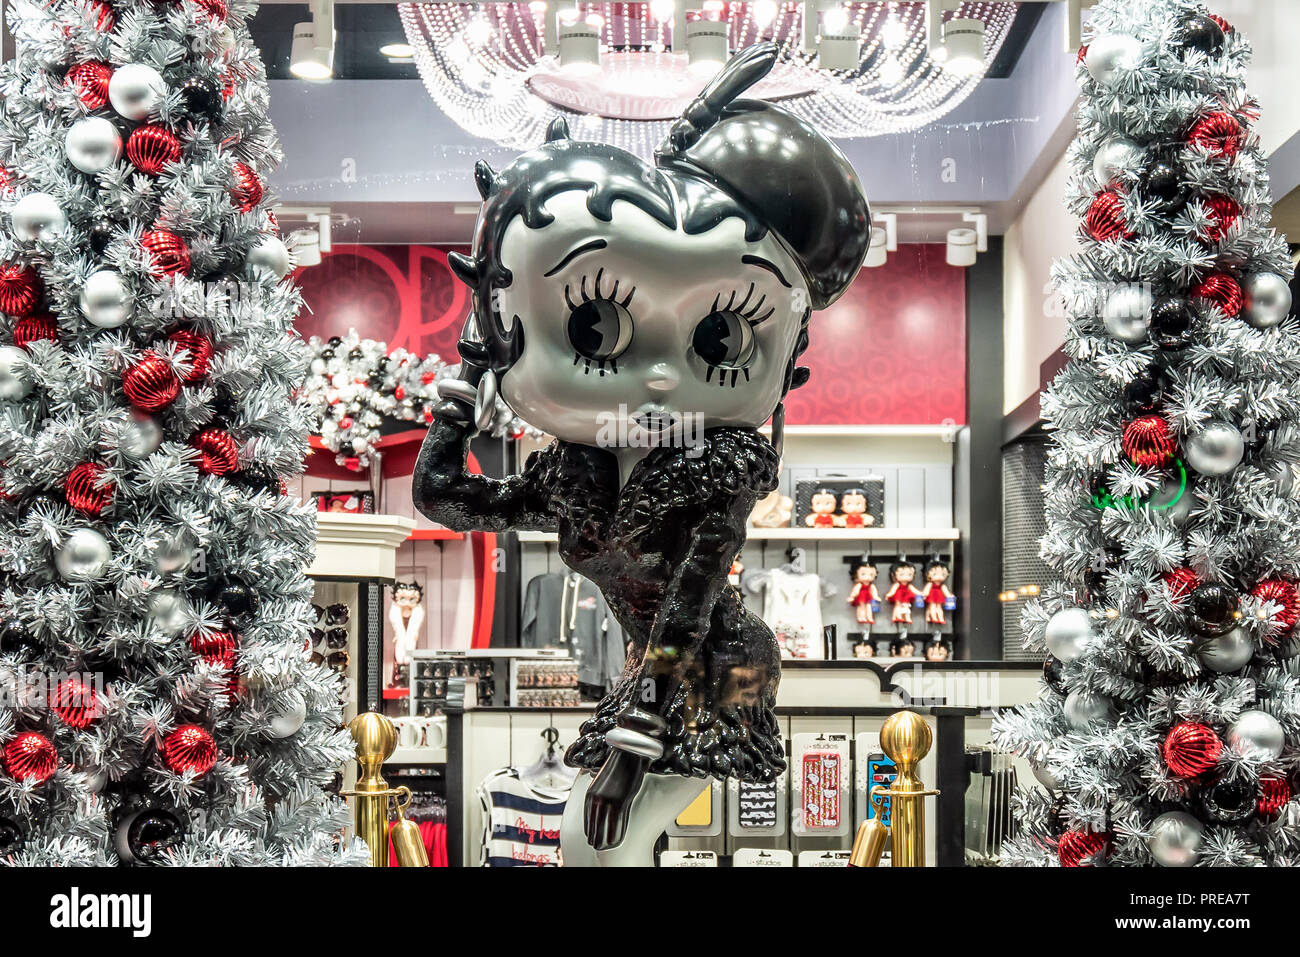 Harry Potter Christmas Ornaments Universal Studios.Universal Studios Orlando Christmas Stock Photos Universal